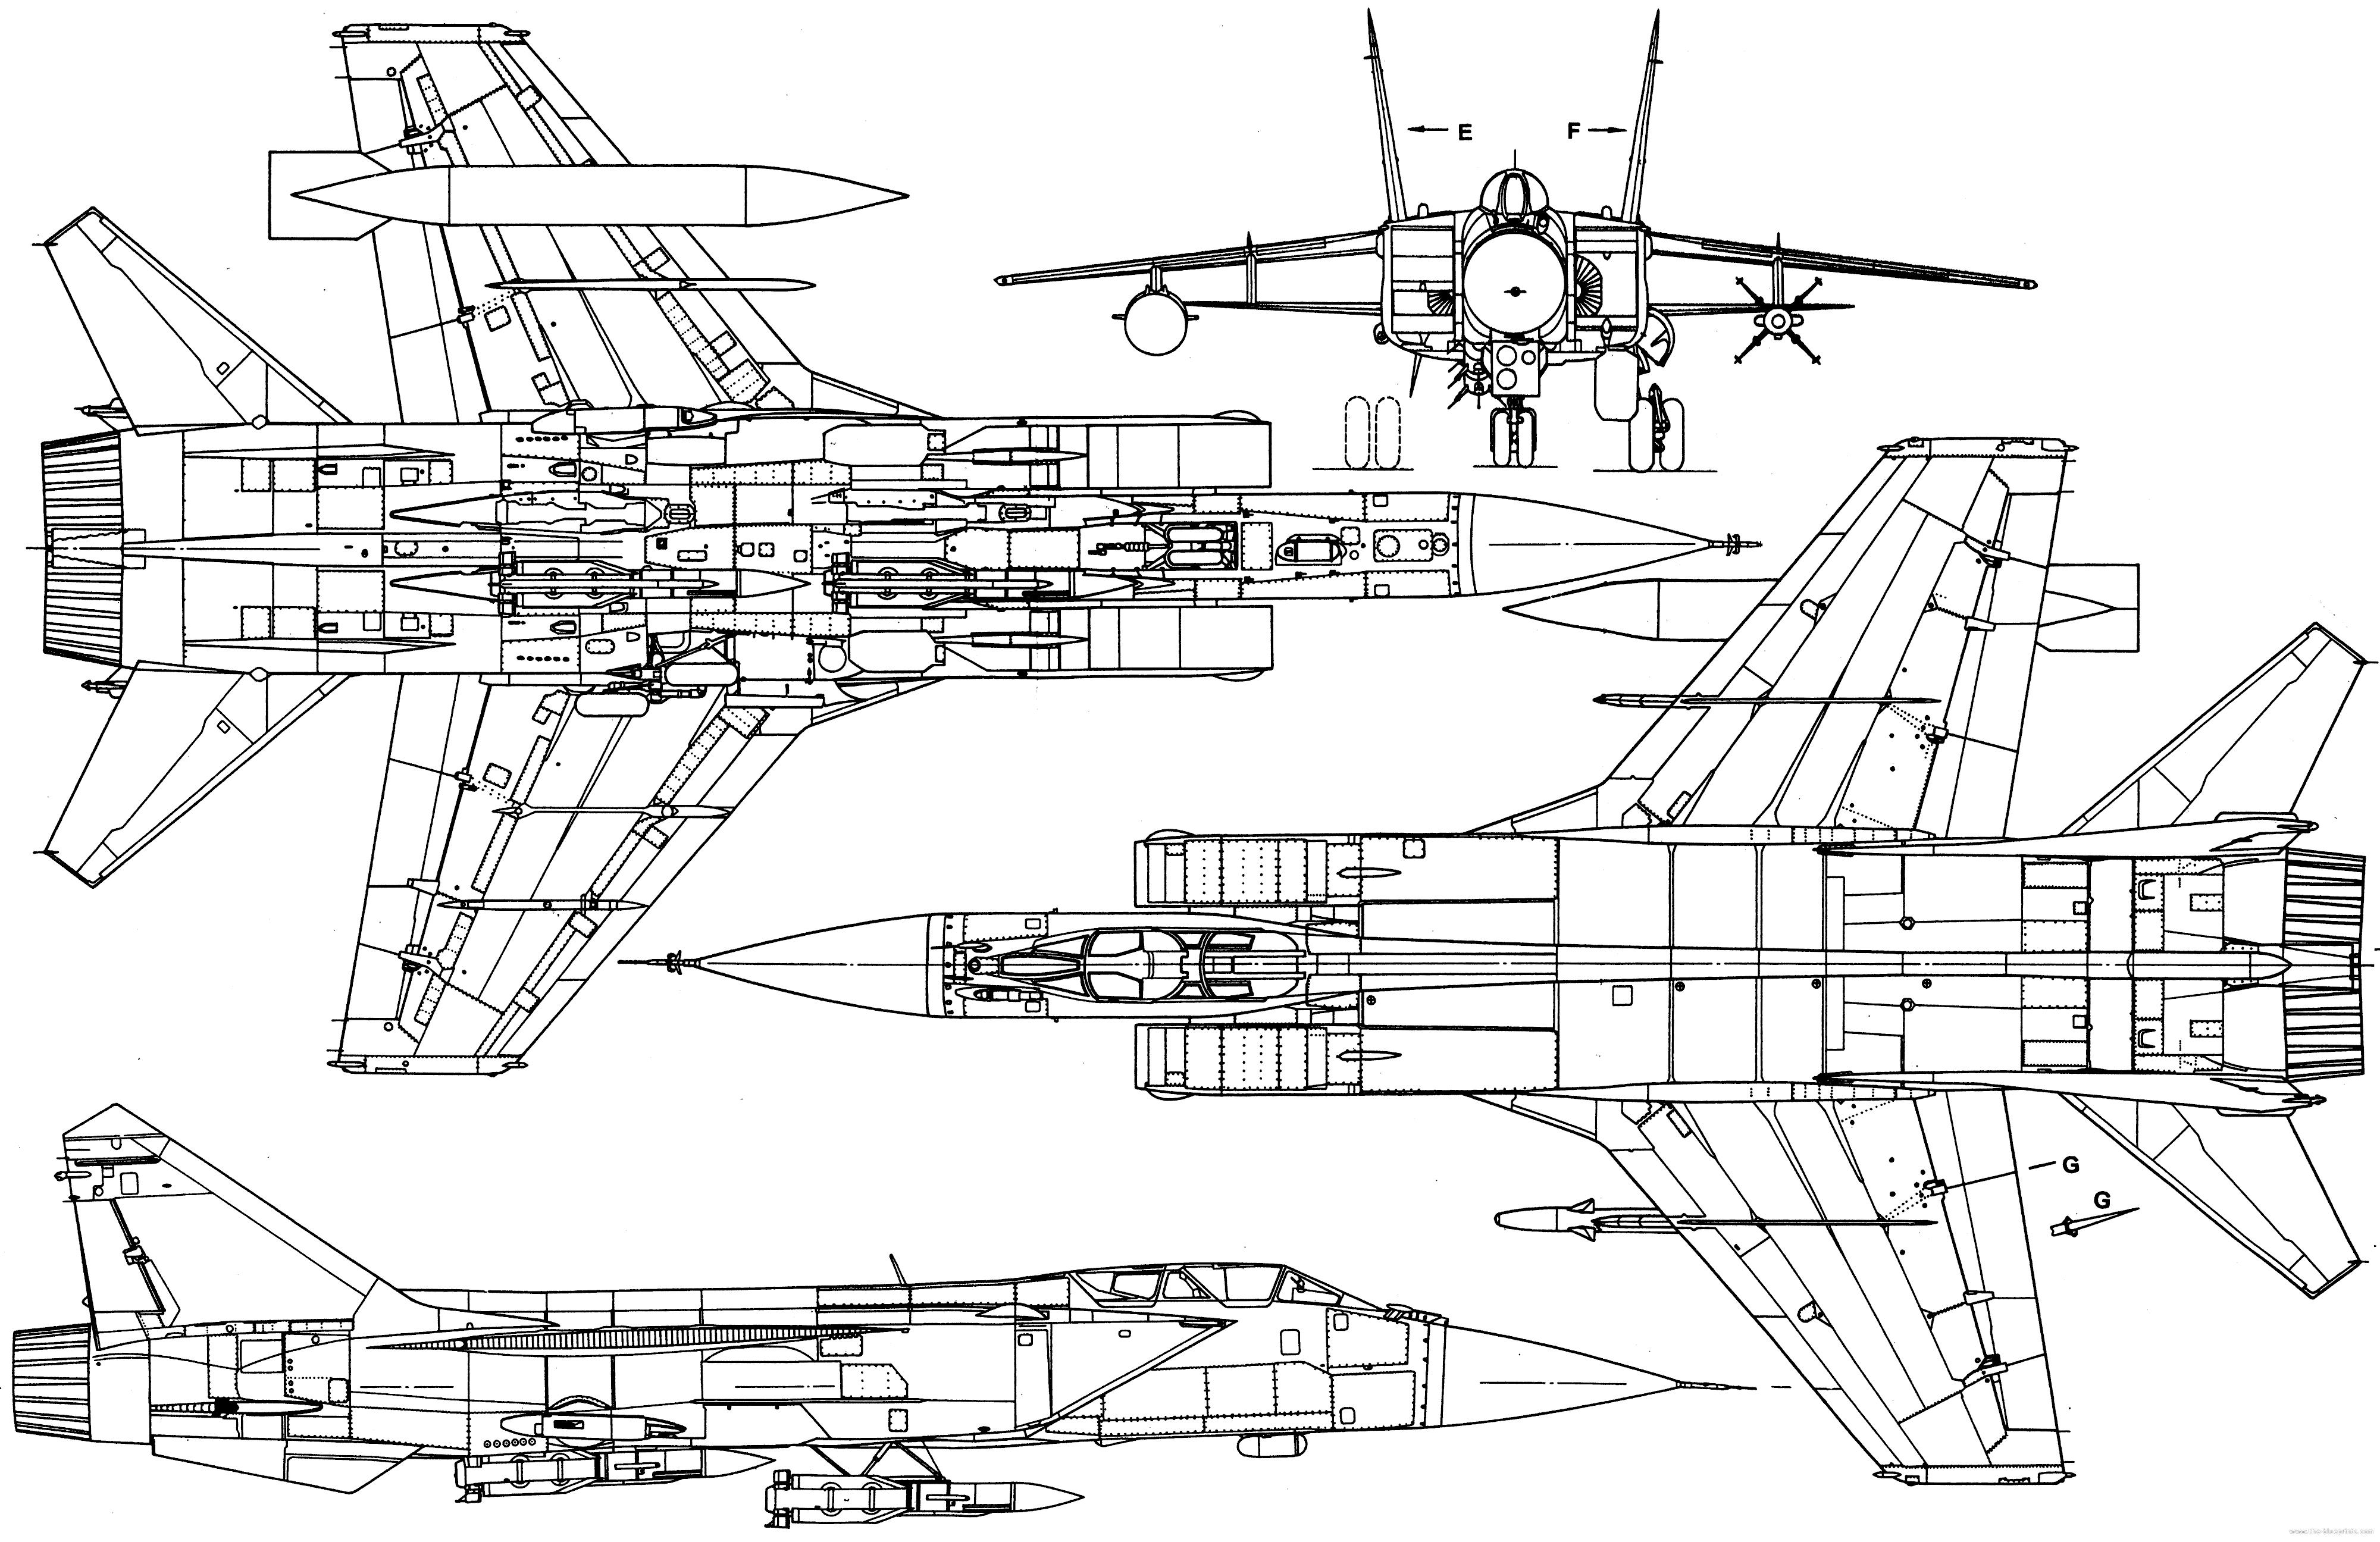 MiG-31 blueprint